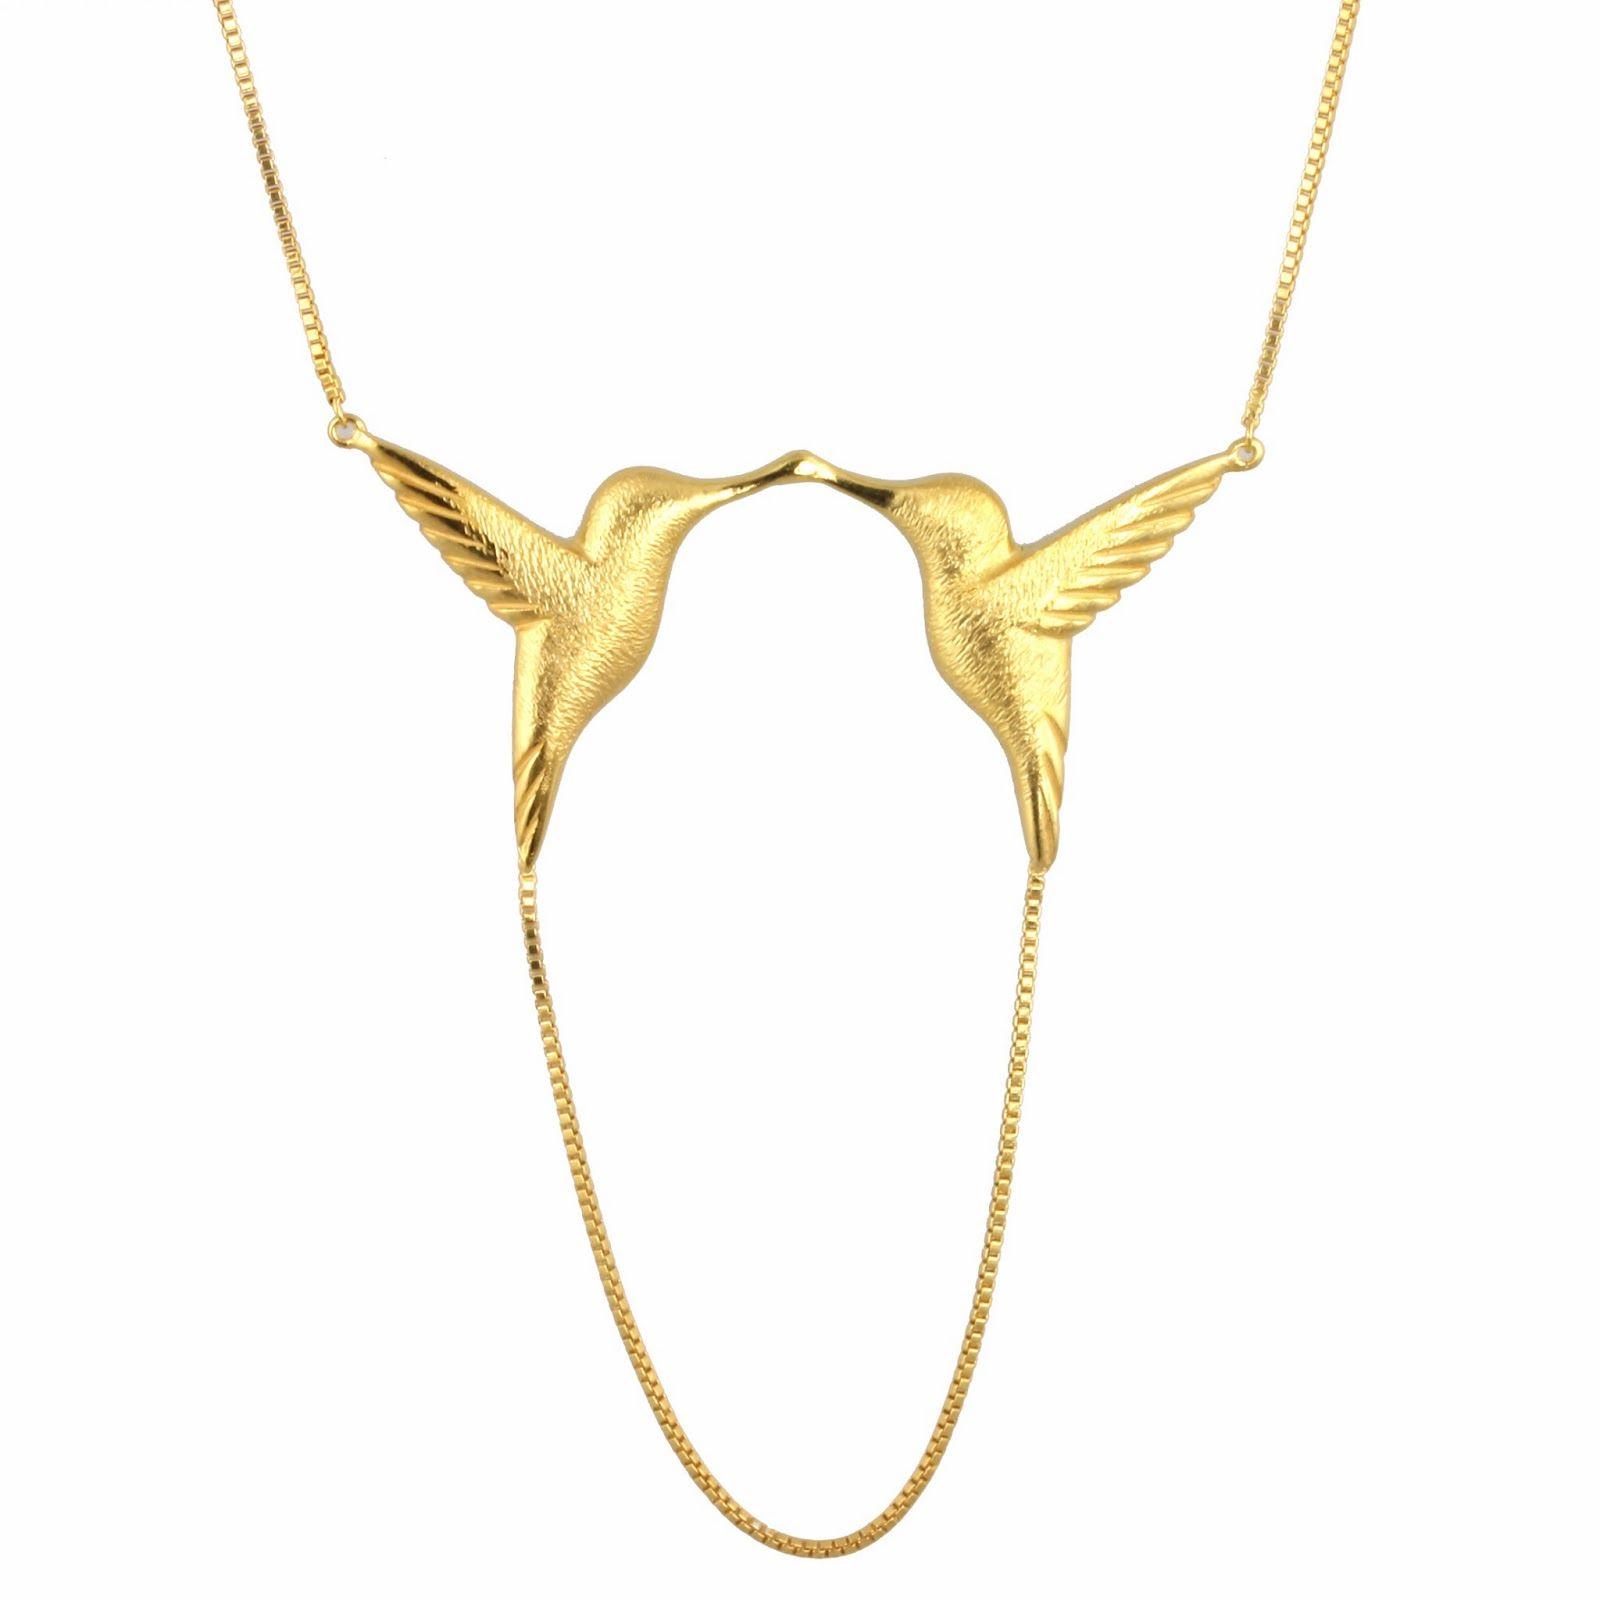 Jana Reinhardt Sterling Silver Twin Hummingbird Necklaces wVLSDgUi